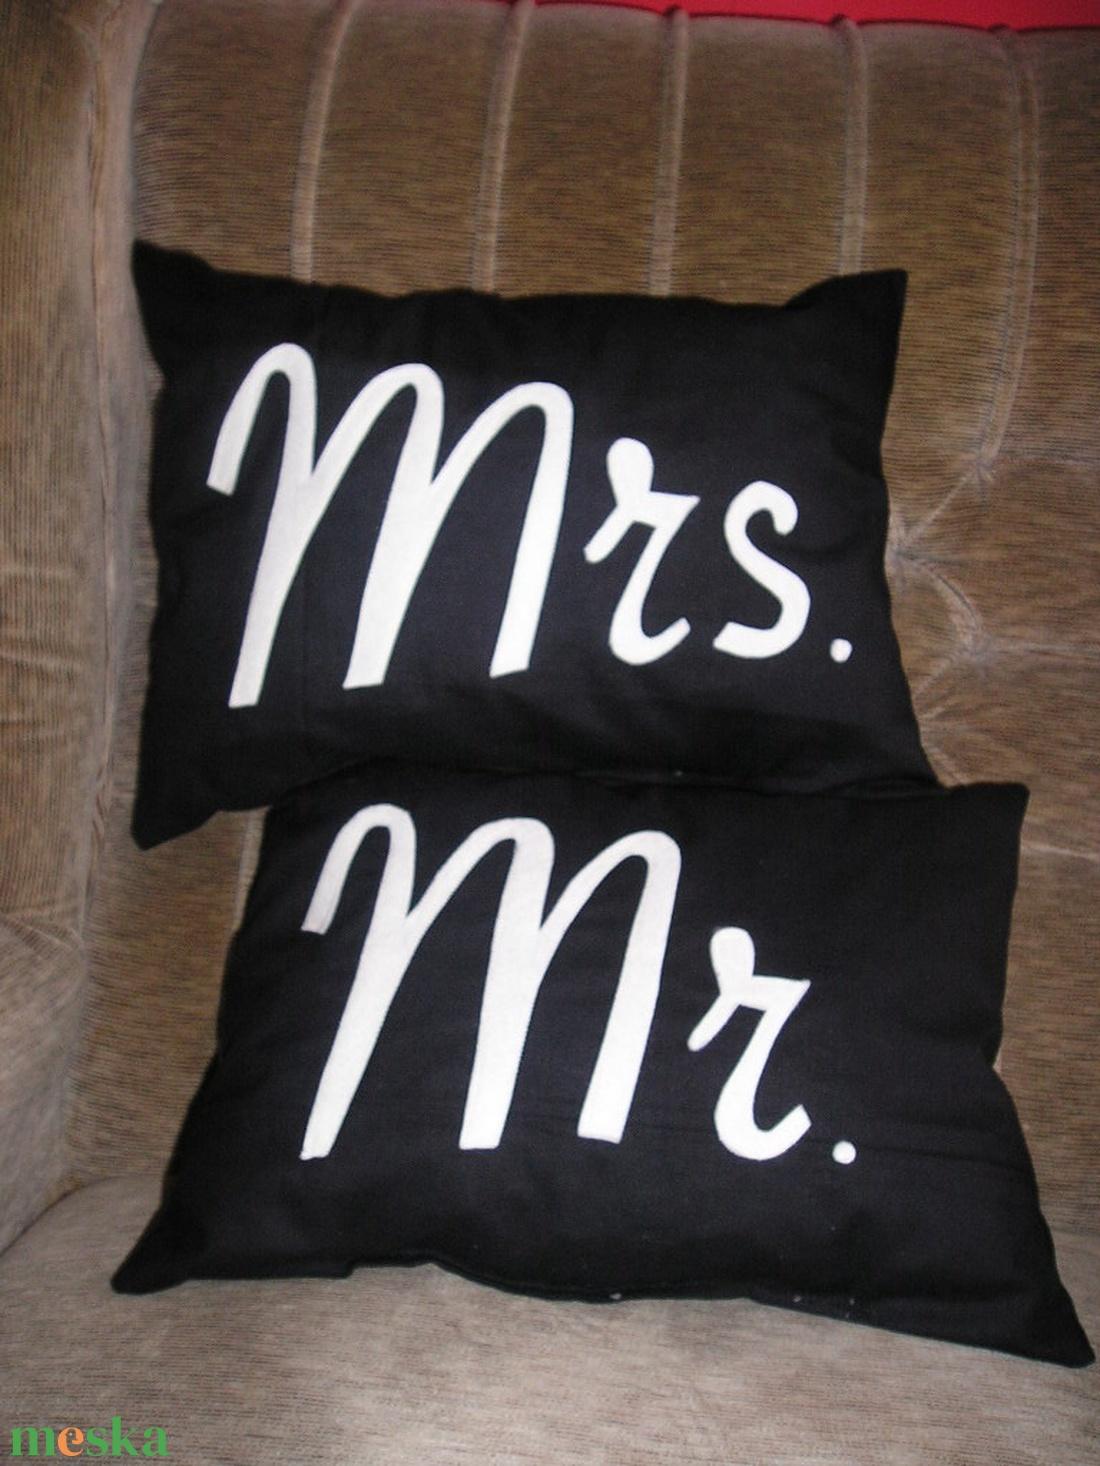 Mr. Mrs. párna szett (giorgo79) - Meska.hu 96b8fe2830